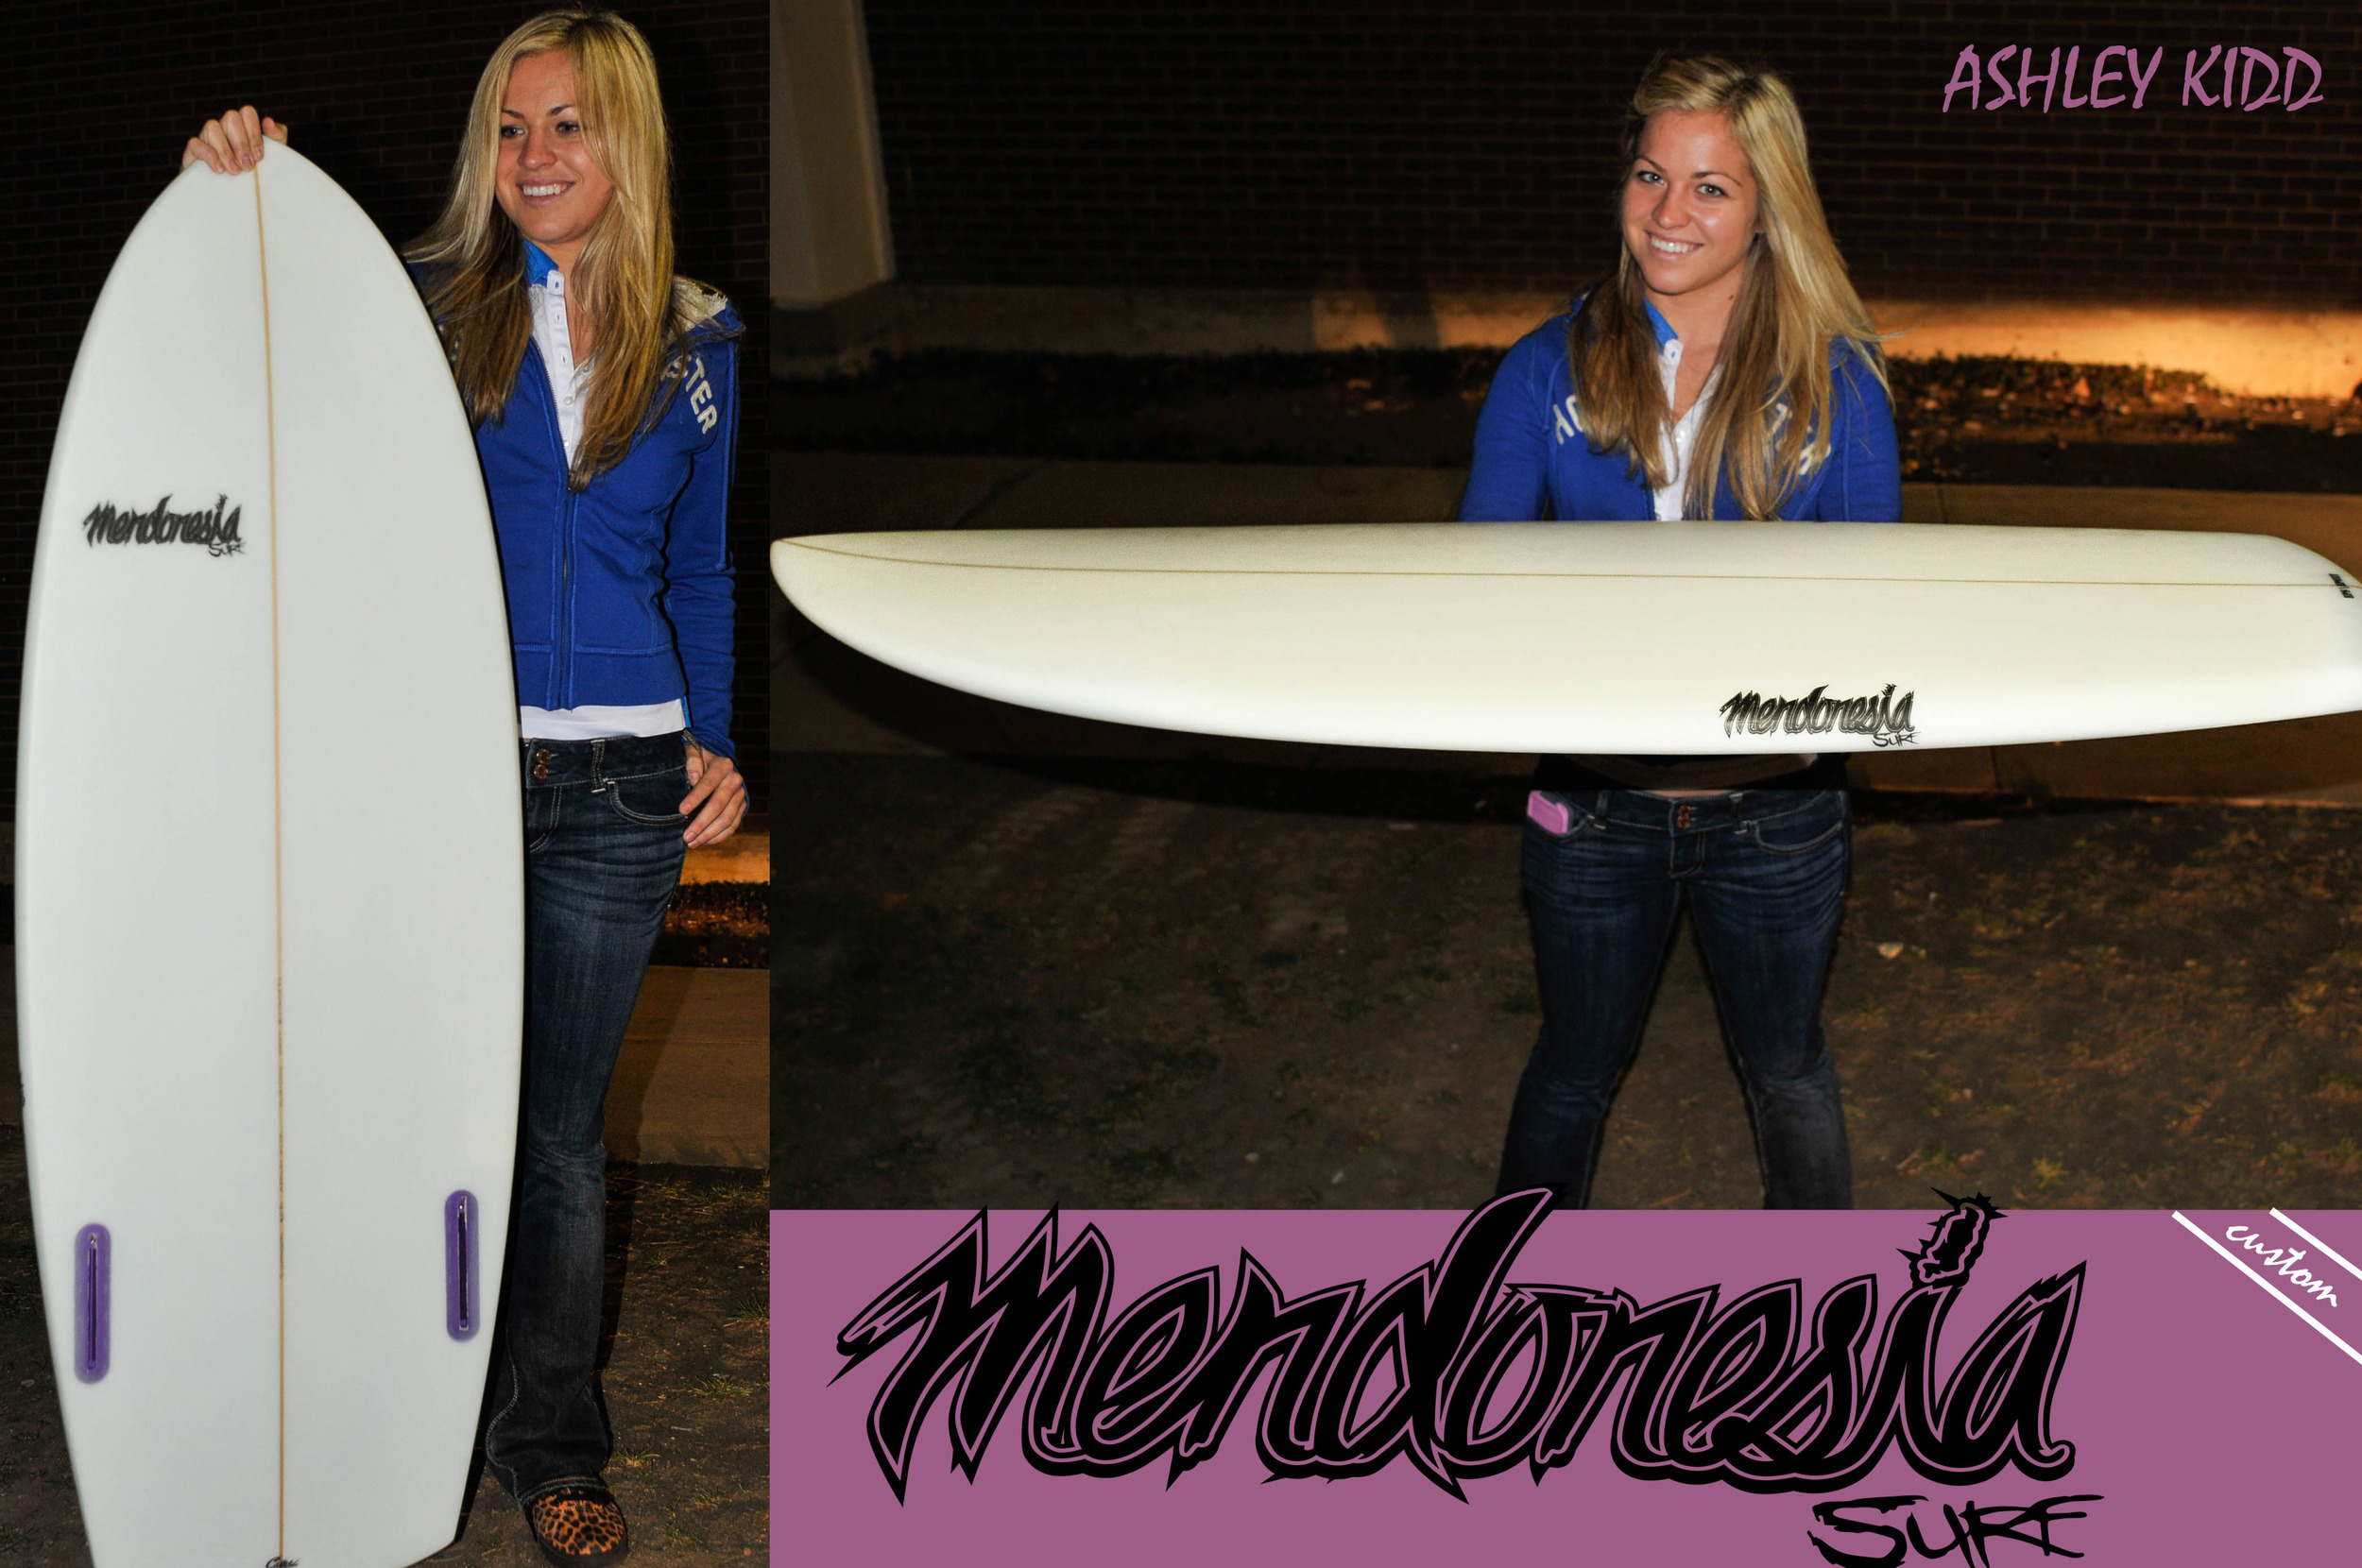 Mendonesia & Tige team pro wakesurf Ashley Kidd